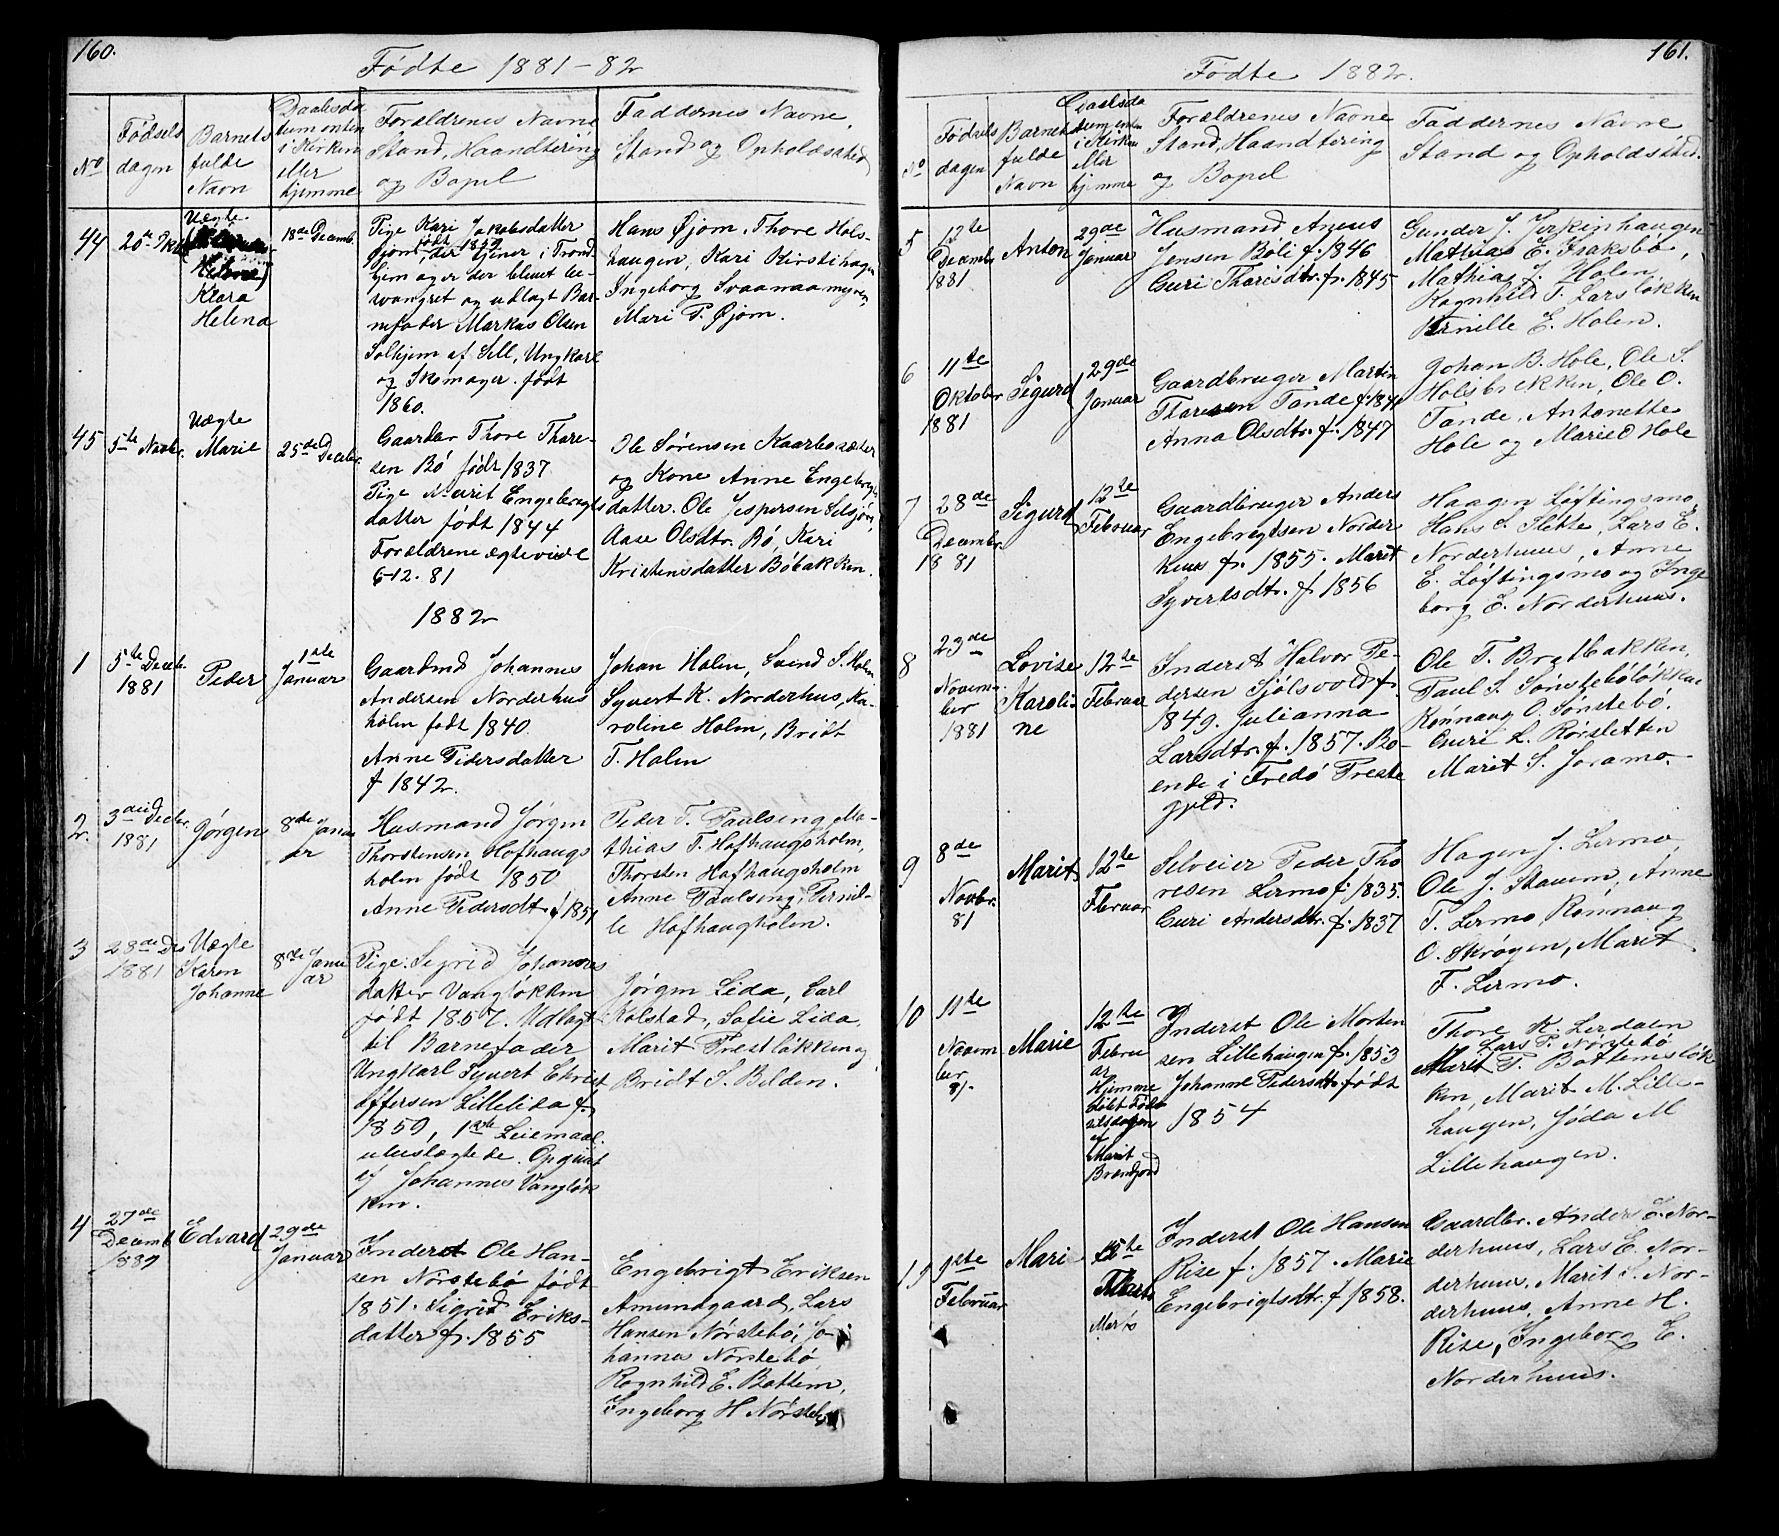 SAH, Lesja prestekontor, Klokkerbok nr. 5, 1850-1894, s. 160-161